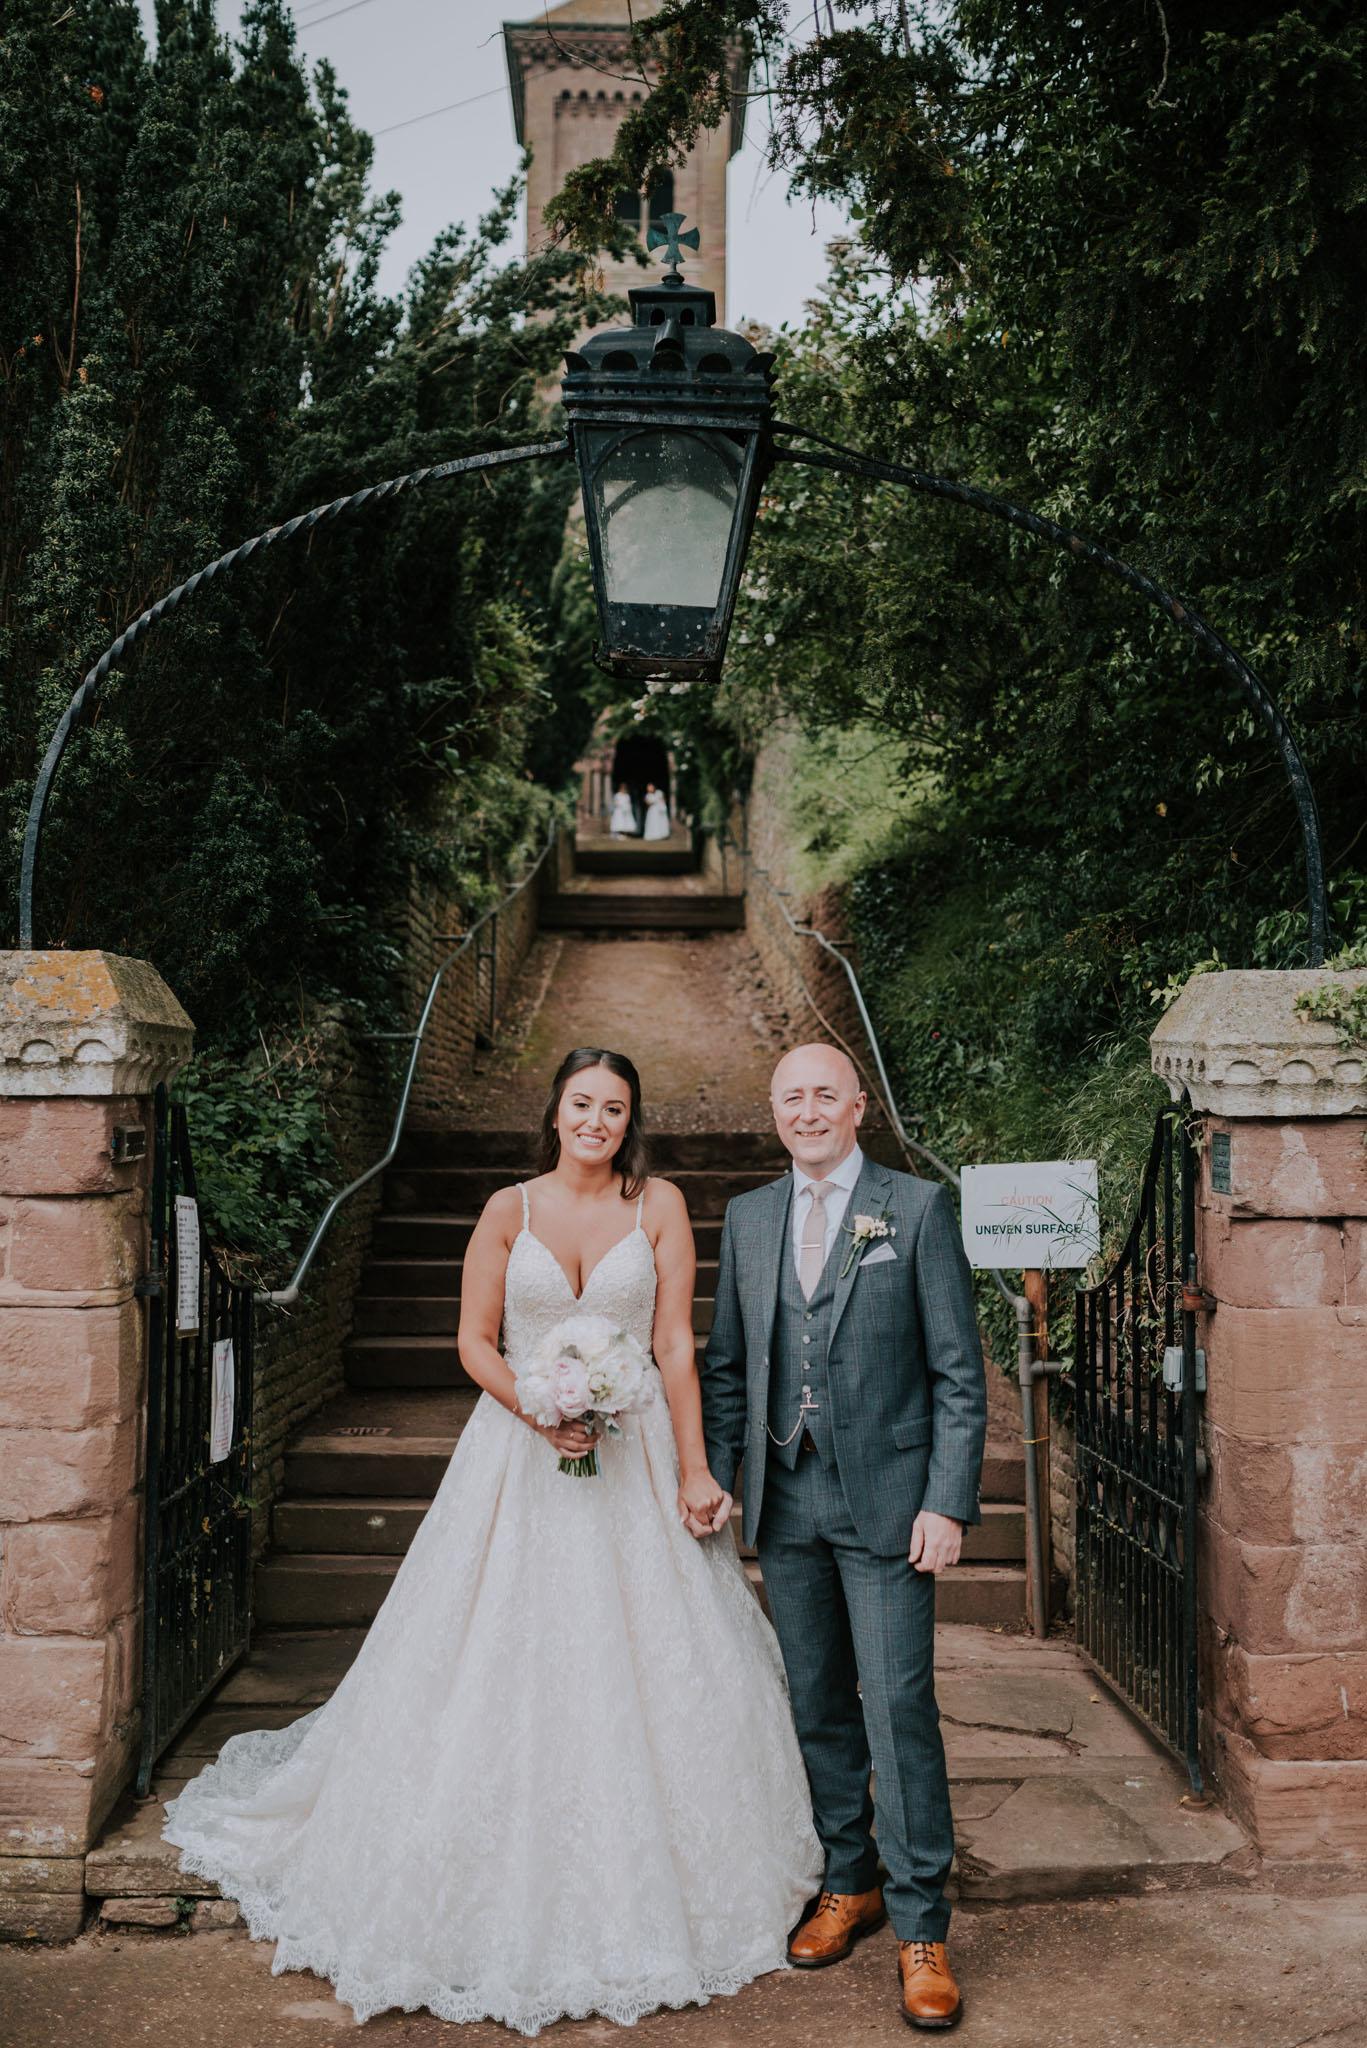 wedding-photographer-glewstone-court-hereford-scott-stockwell-photography140.jpg